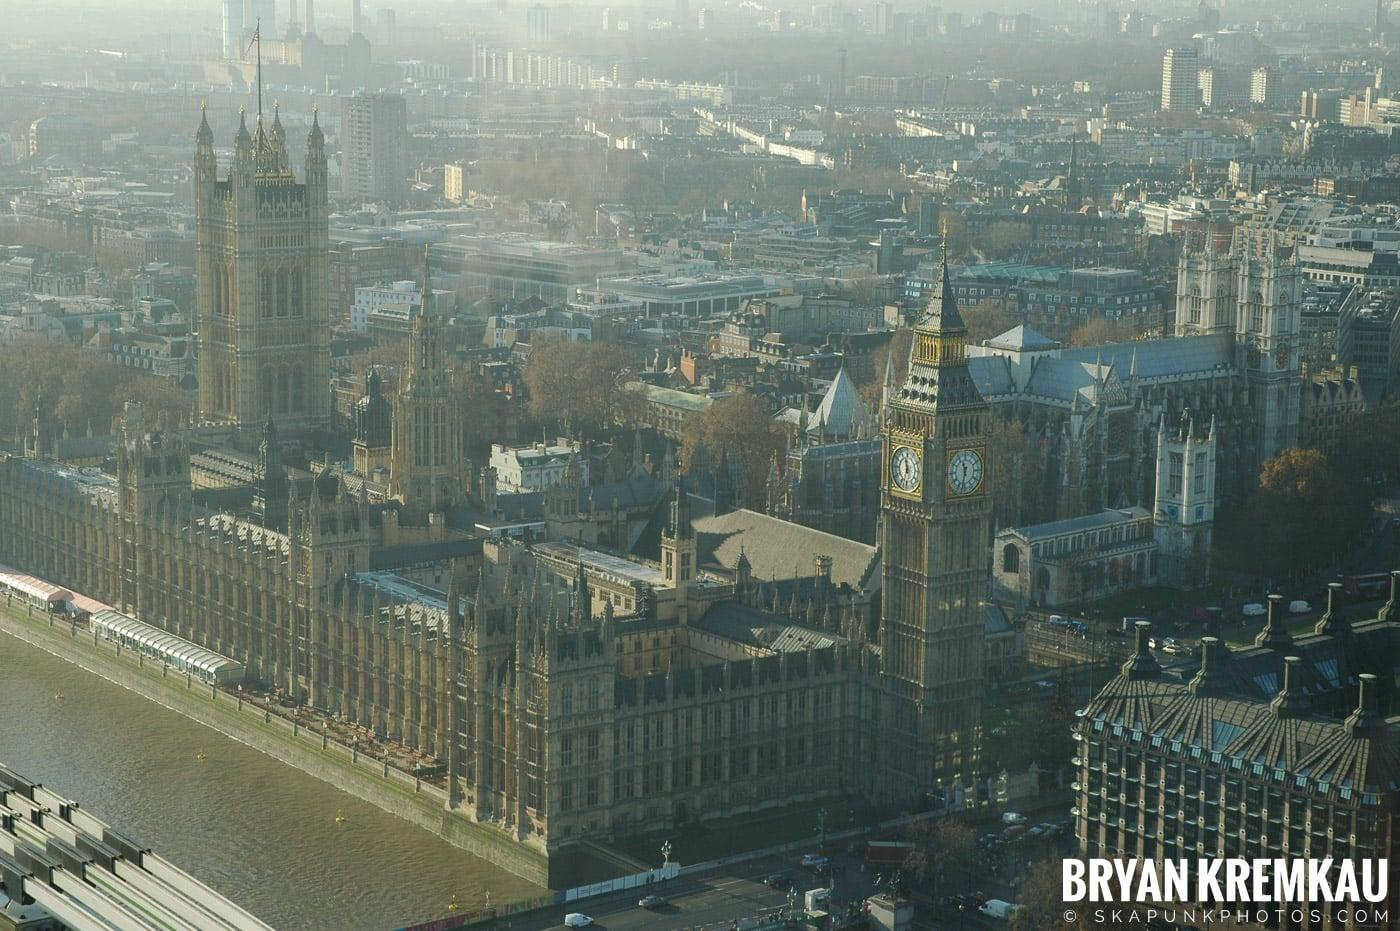 London, England - Day 4 - 12.19.05 (35)